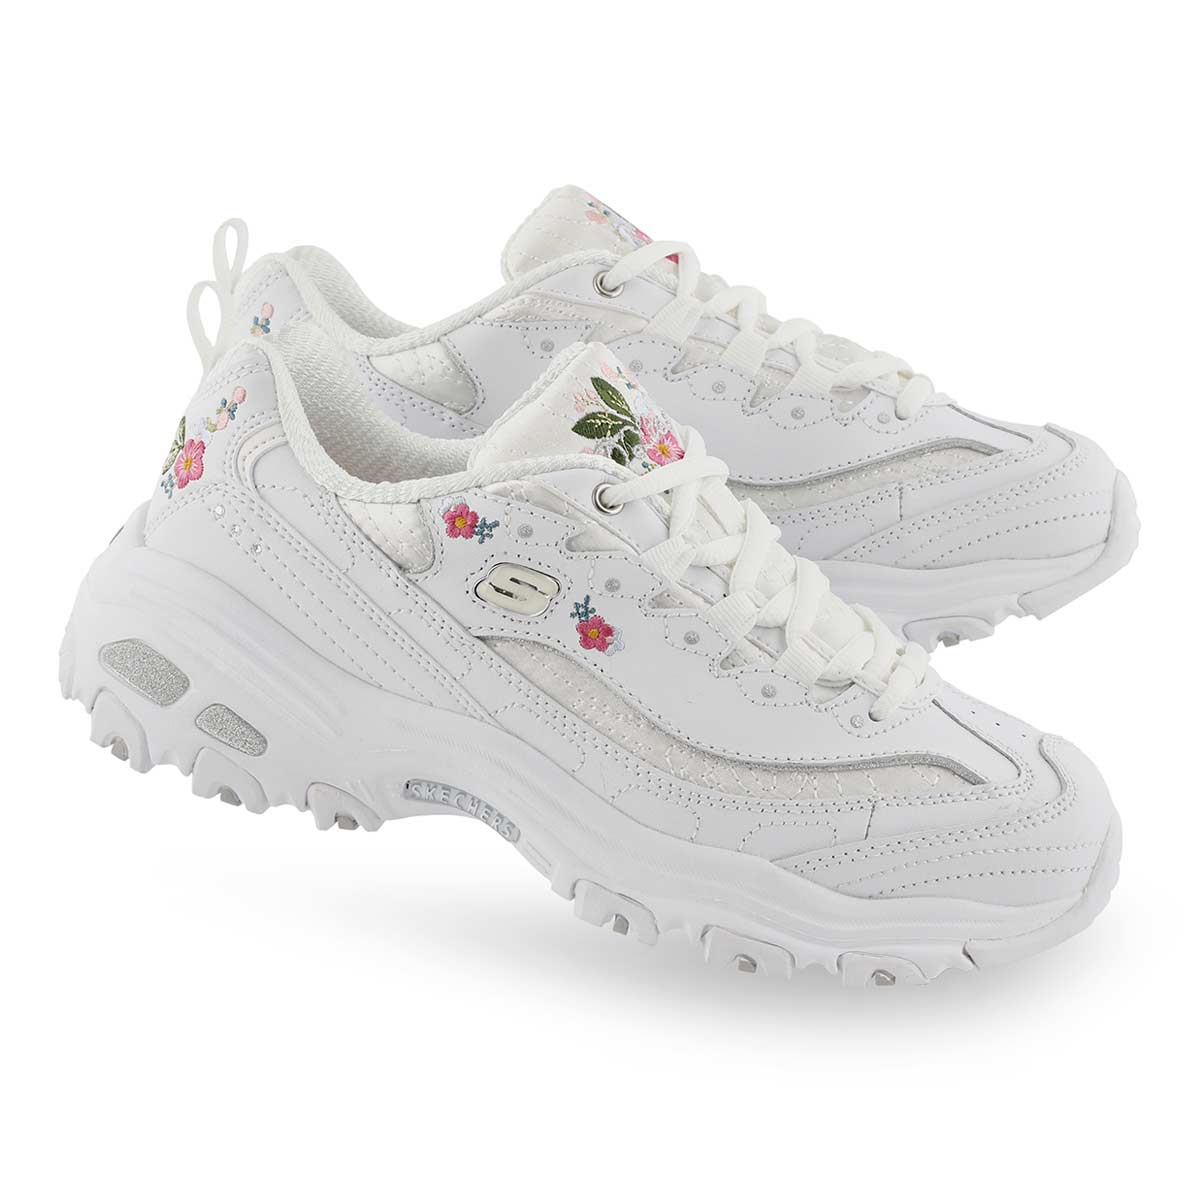 Espa. D'Lites Bright Blossoms,blanc, fem